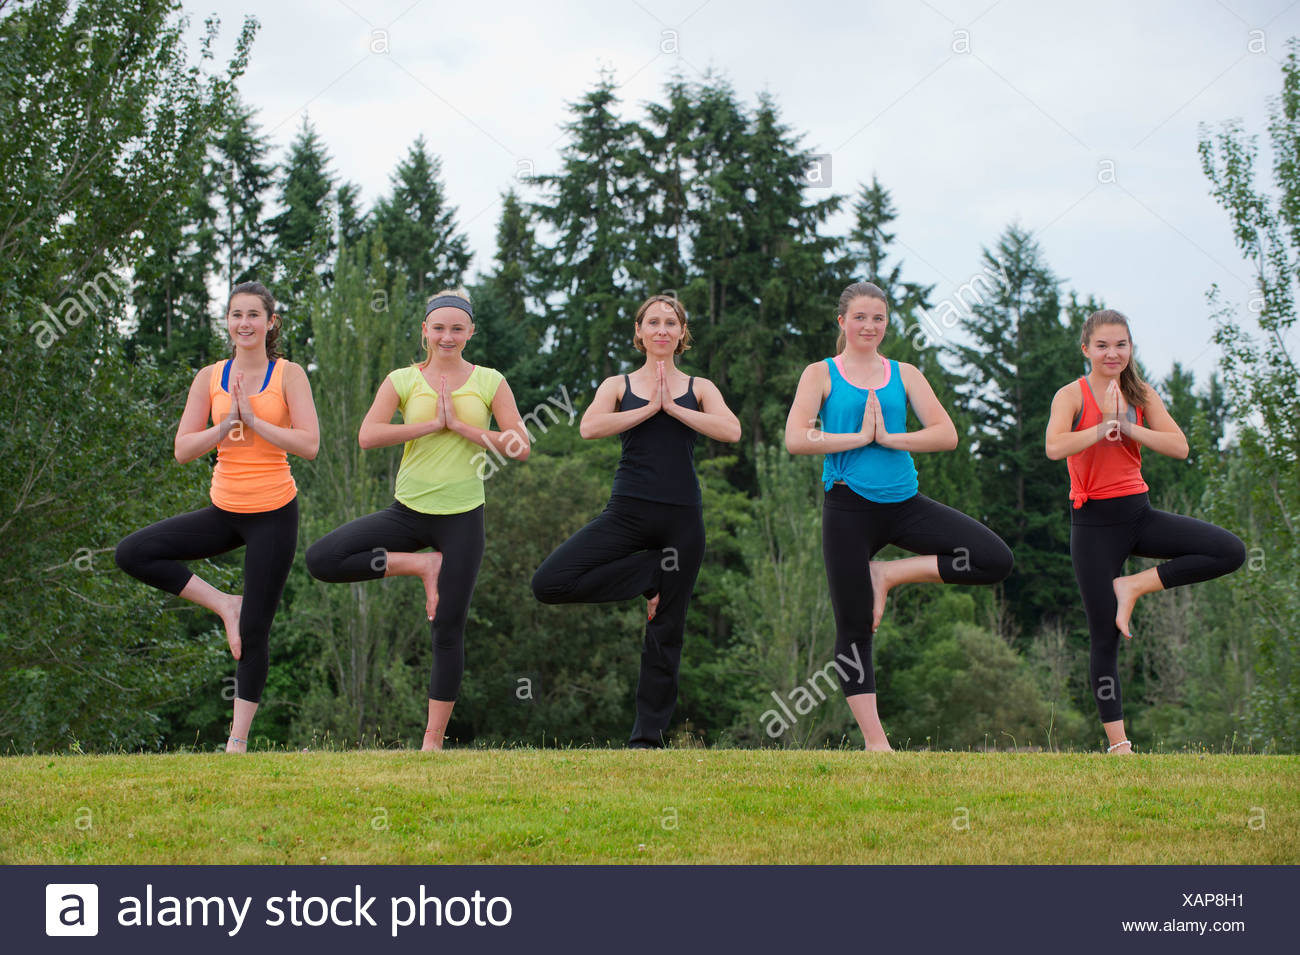 Teenage girls and yoga tutor doing tree poses - Stock Image